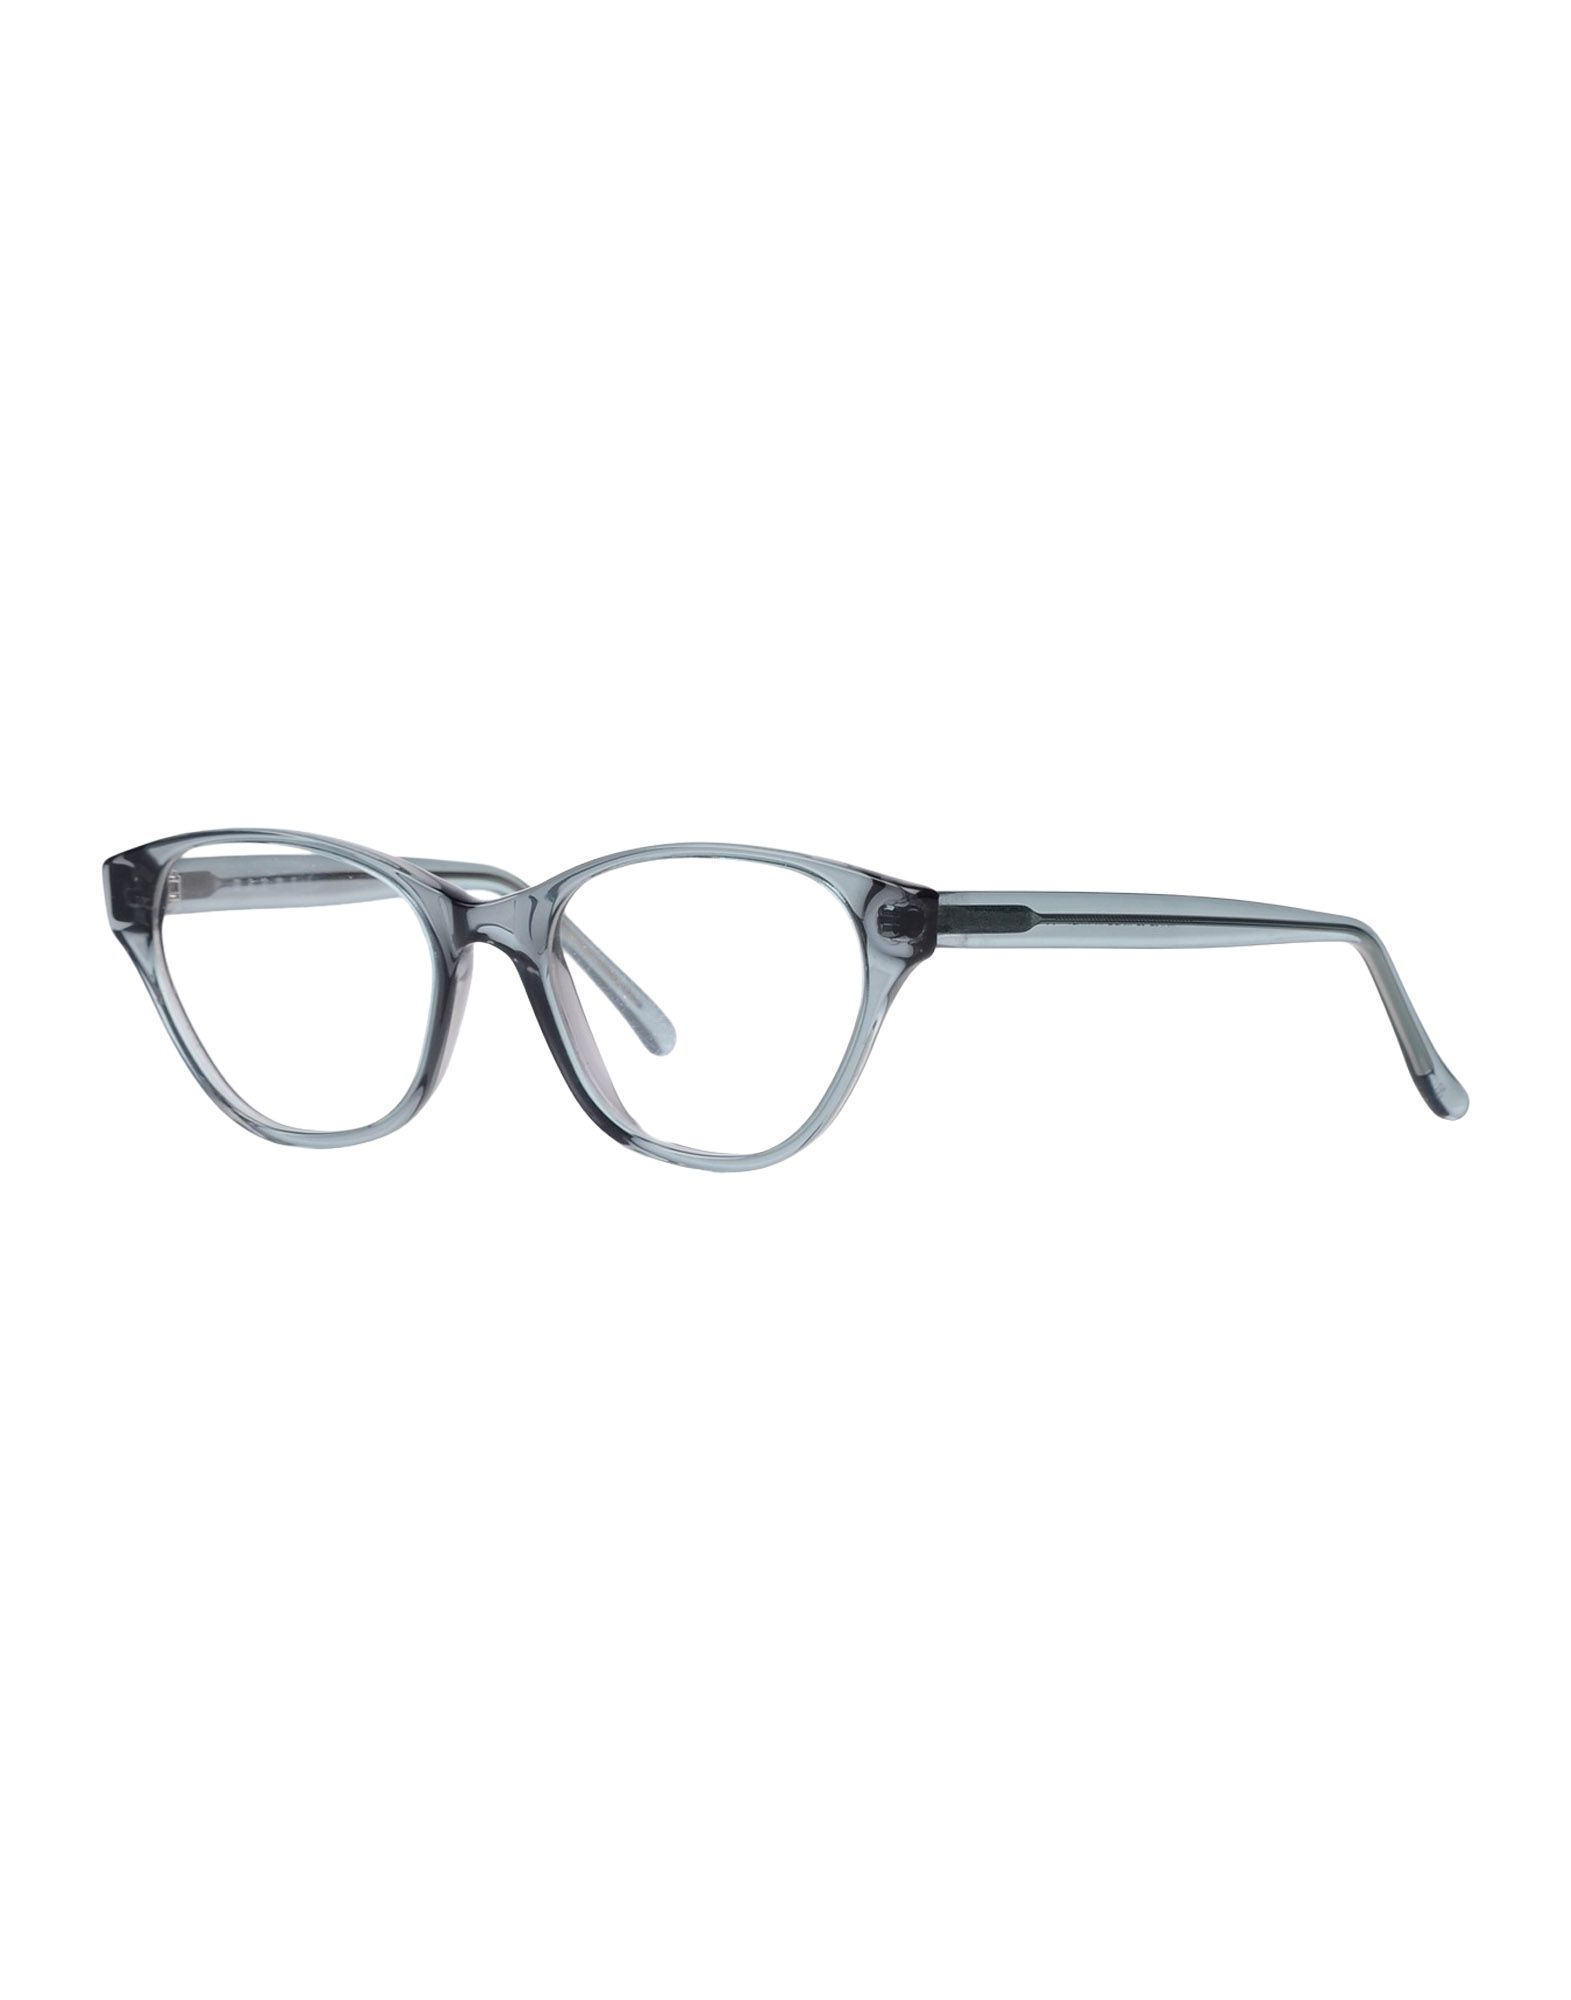 MARNI Damen Brille Farbe Grau Größe 1